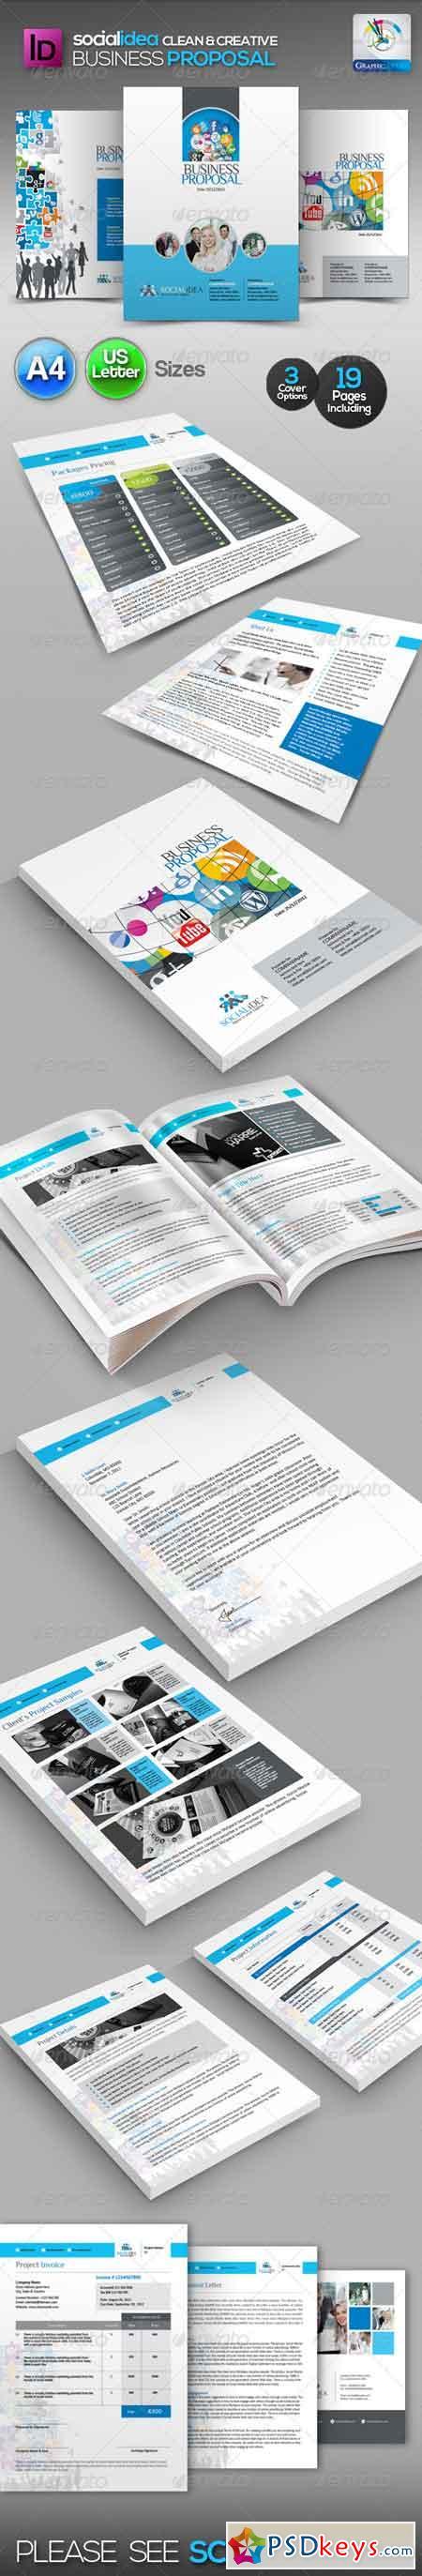 Socialidea Clean Business Proposal 3490838